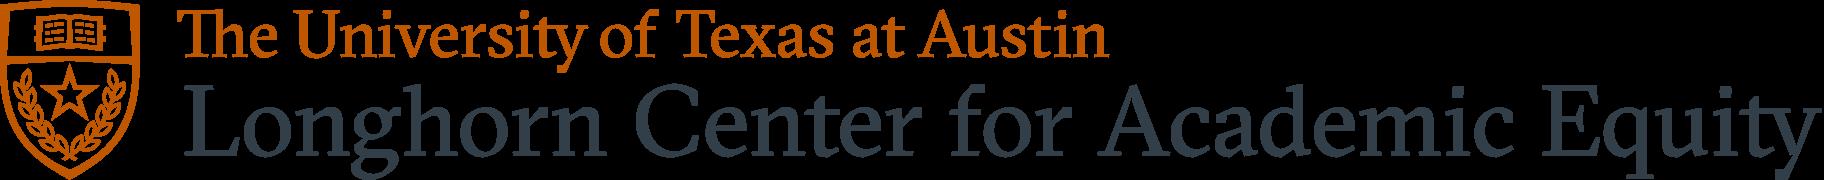 Longhorn Center for Academic Equity